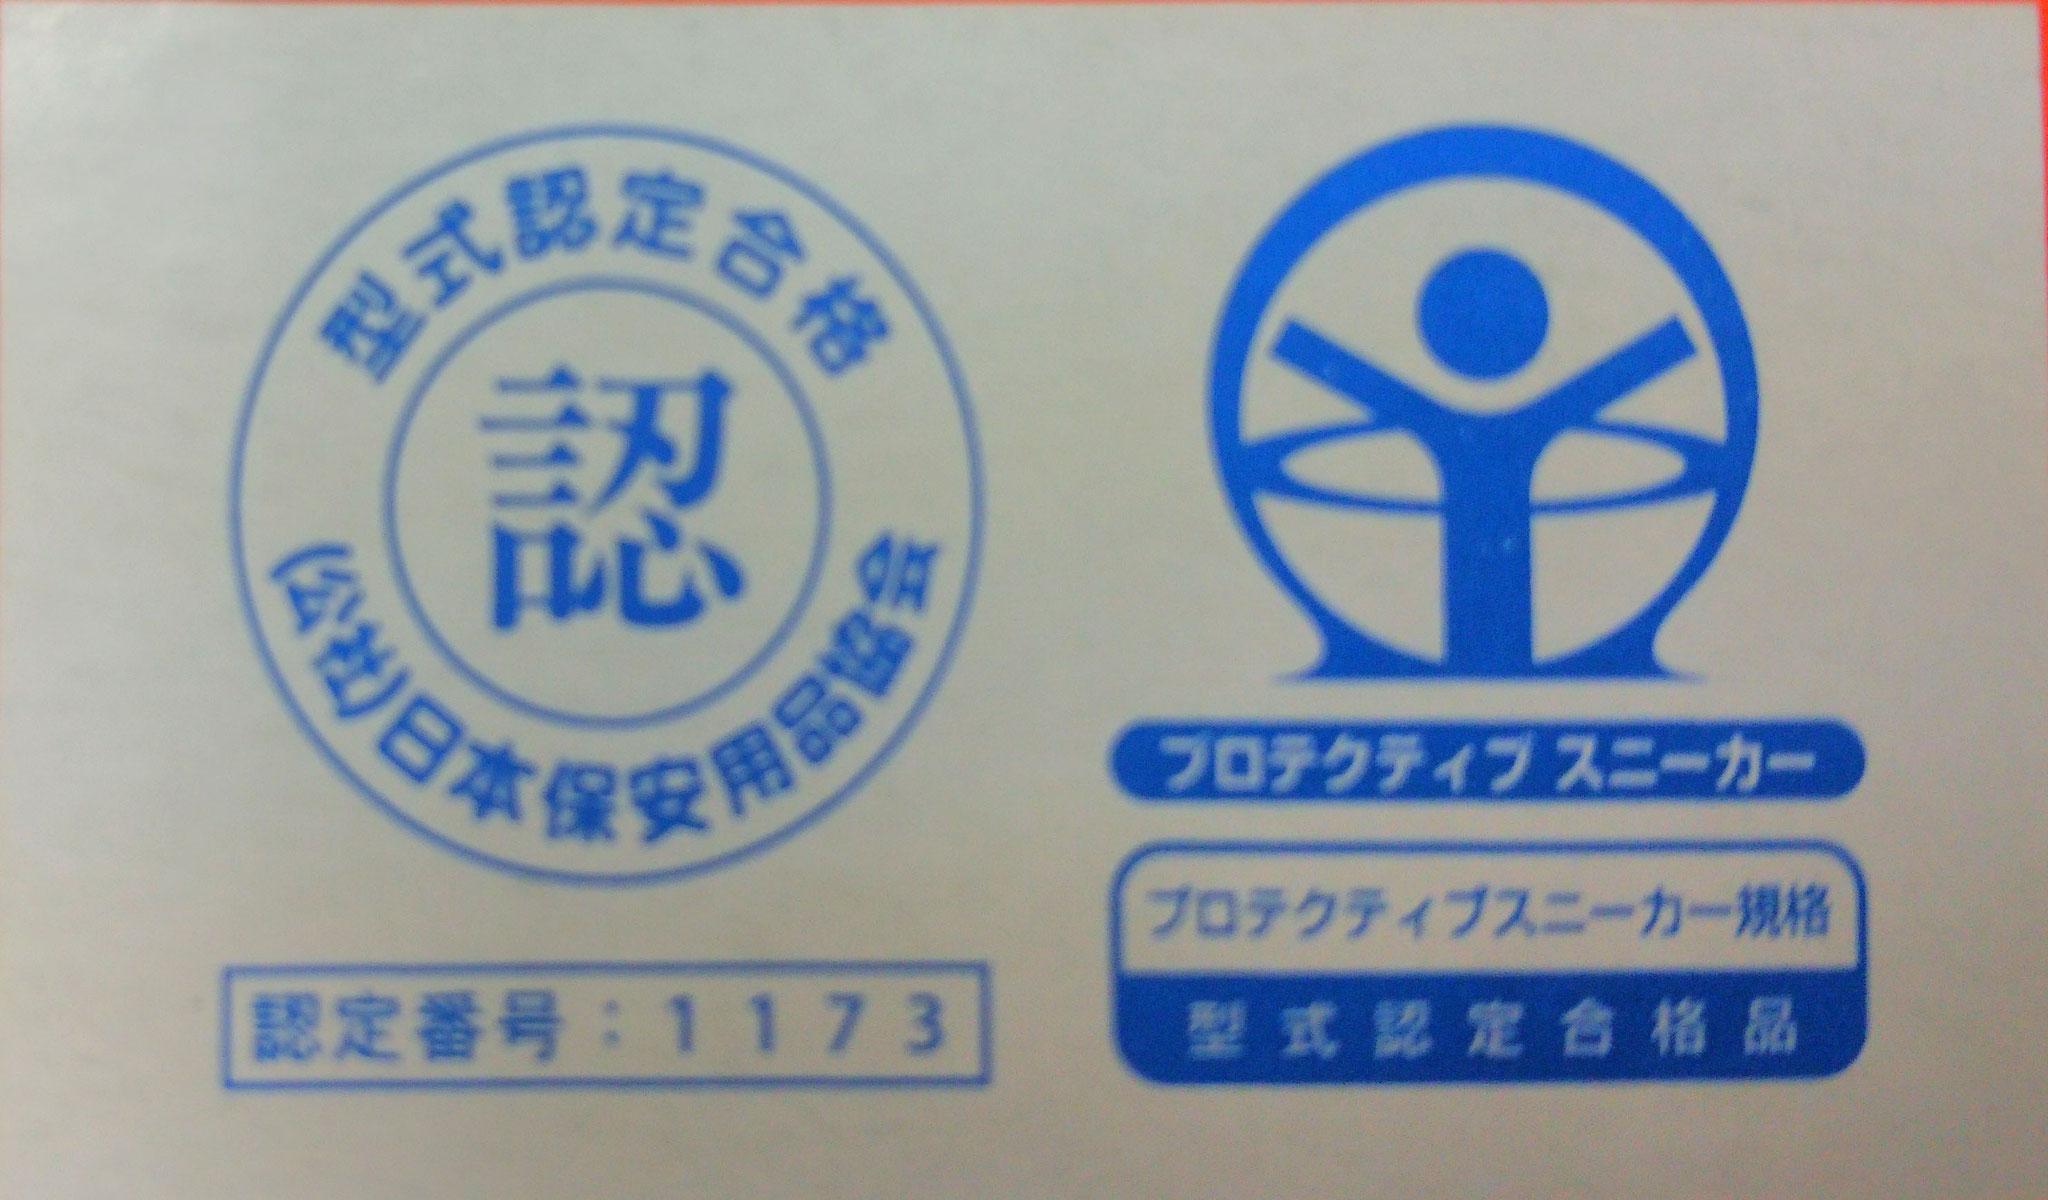 JW-750  安全靴 ¥3,300(税込) 安心のJSAA(日本保安用品協会)  A種  認定商品です。